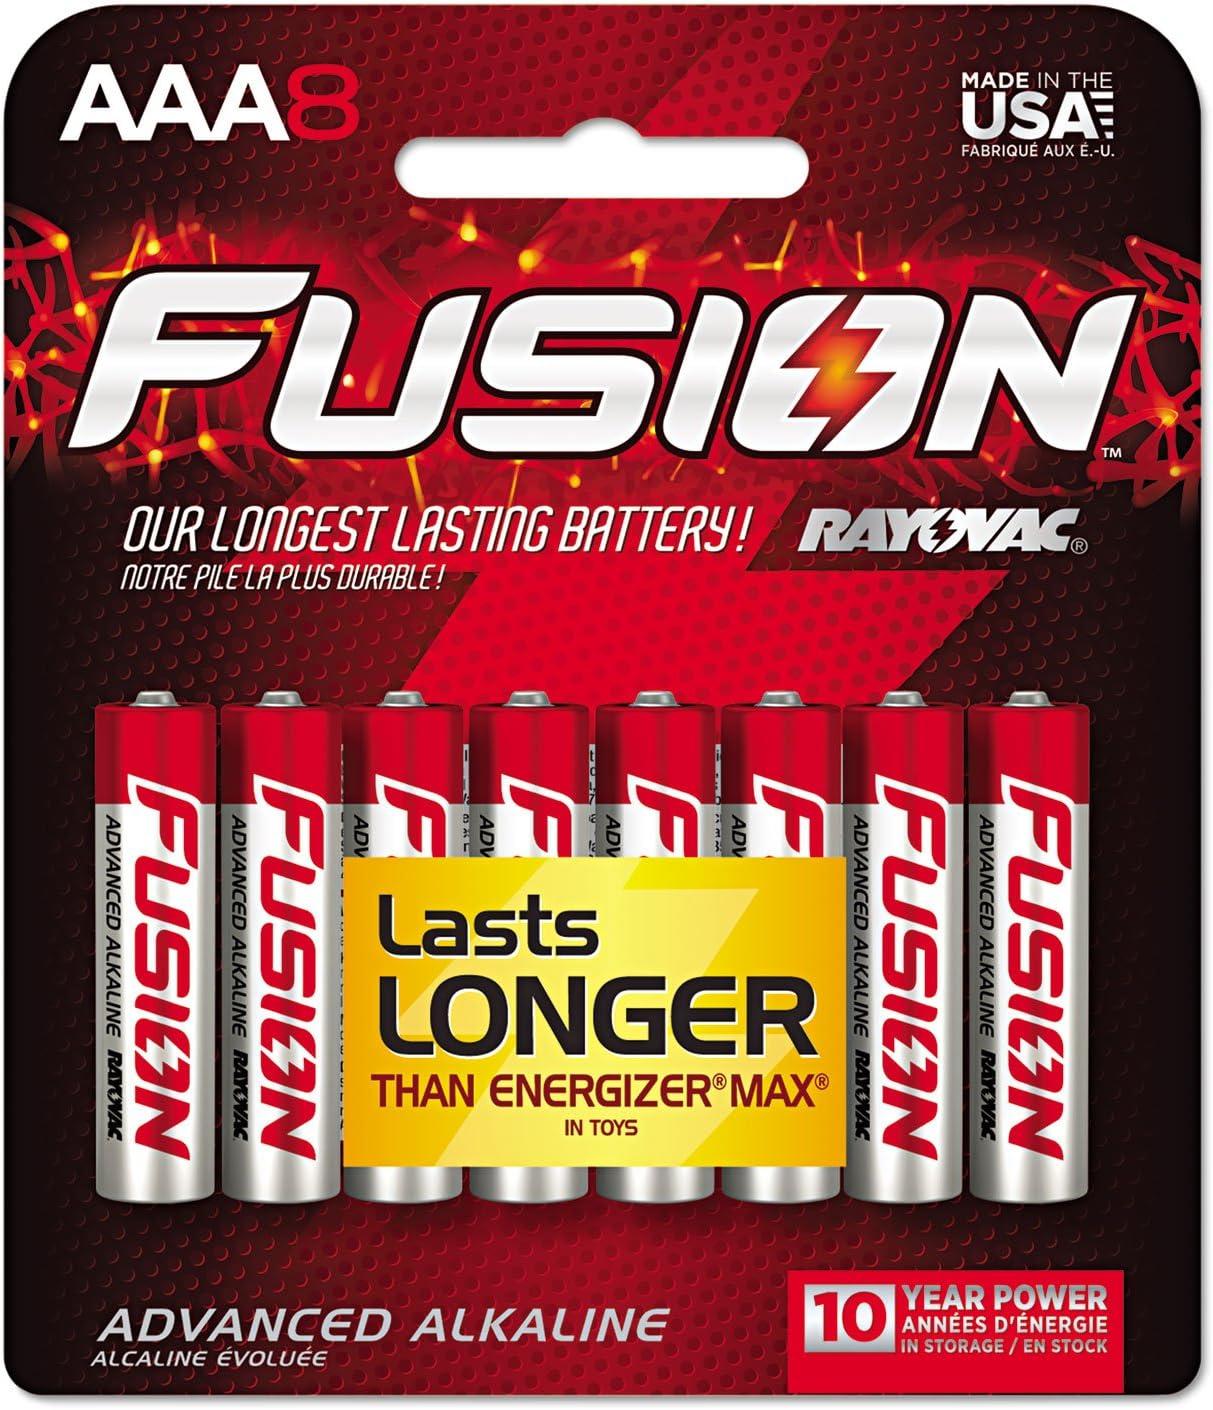 Rayovac 8248TFUSK Fusion Advanced Alkaline Batteries AAA New Free Shipping 8 Max 80% OFF Pack